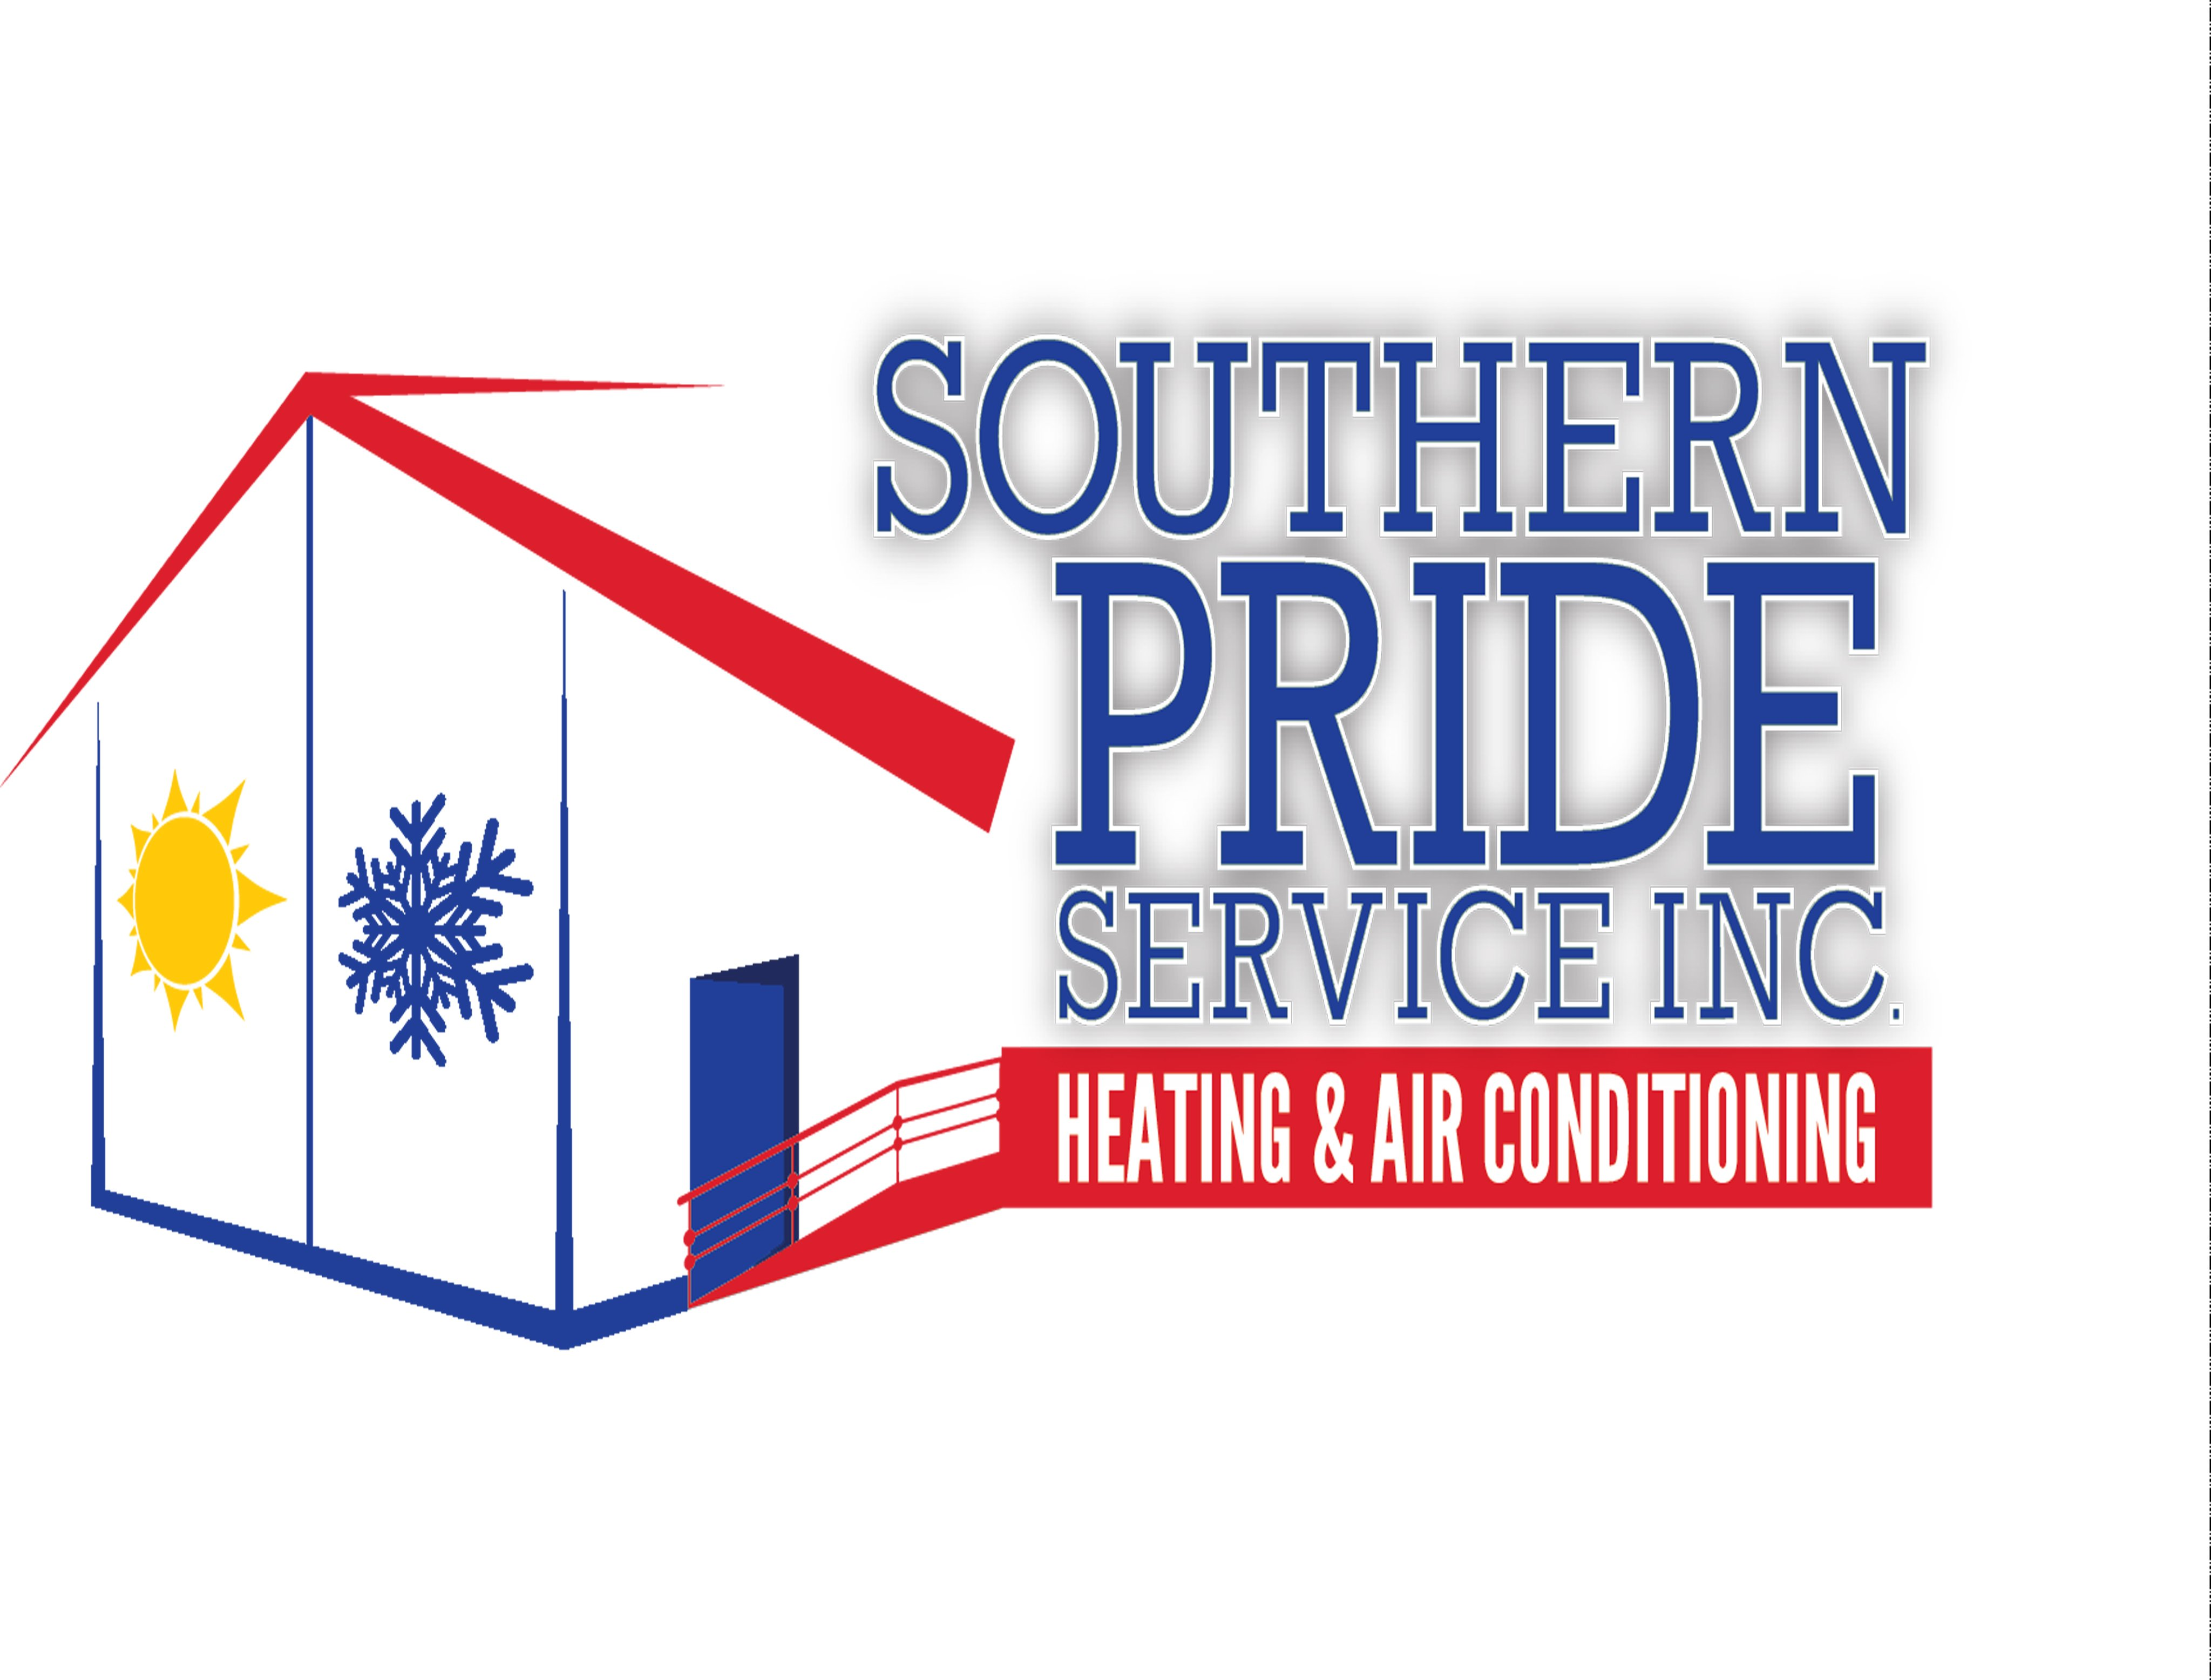 Southern Pride Service